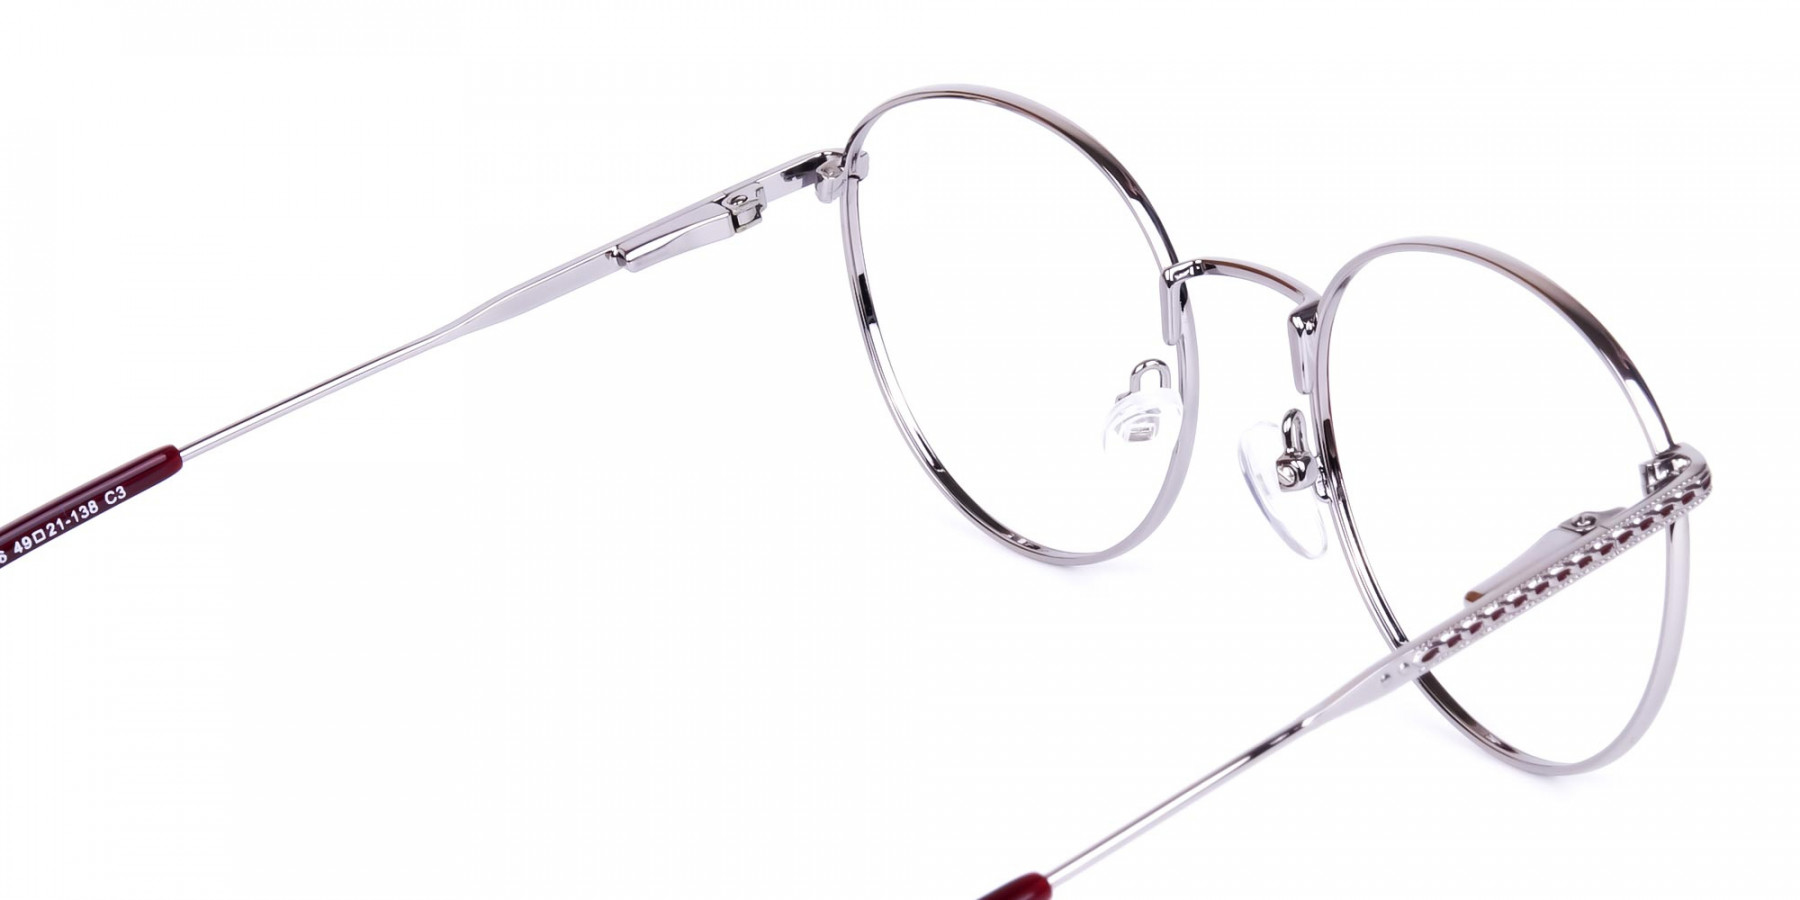 Burgundy-Silver-Round-Full-Rim-Glasses-1